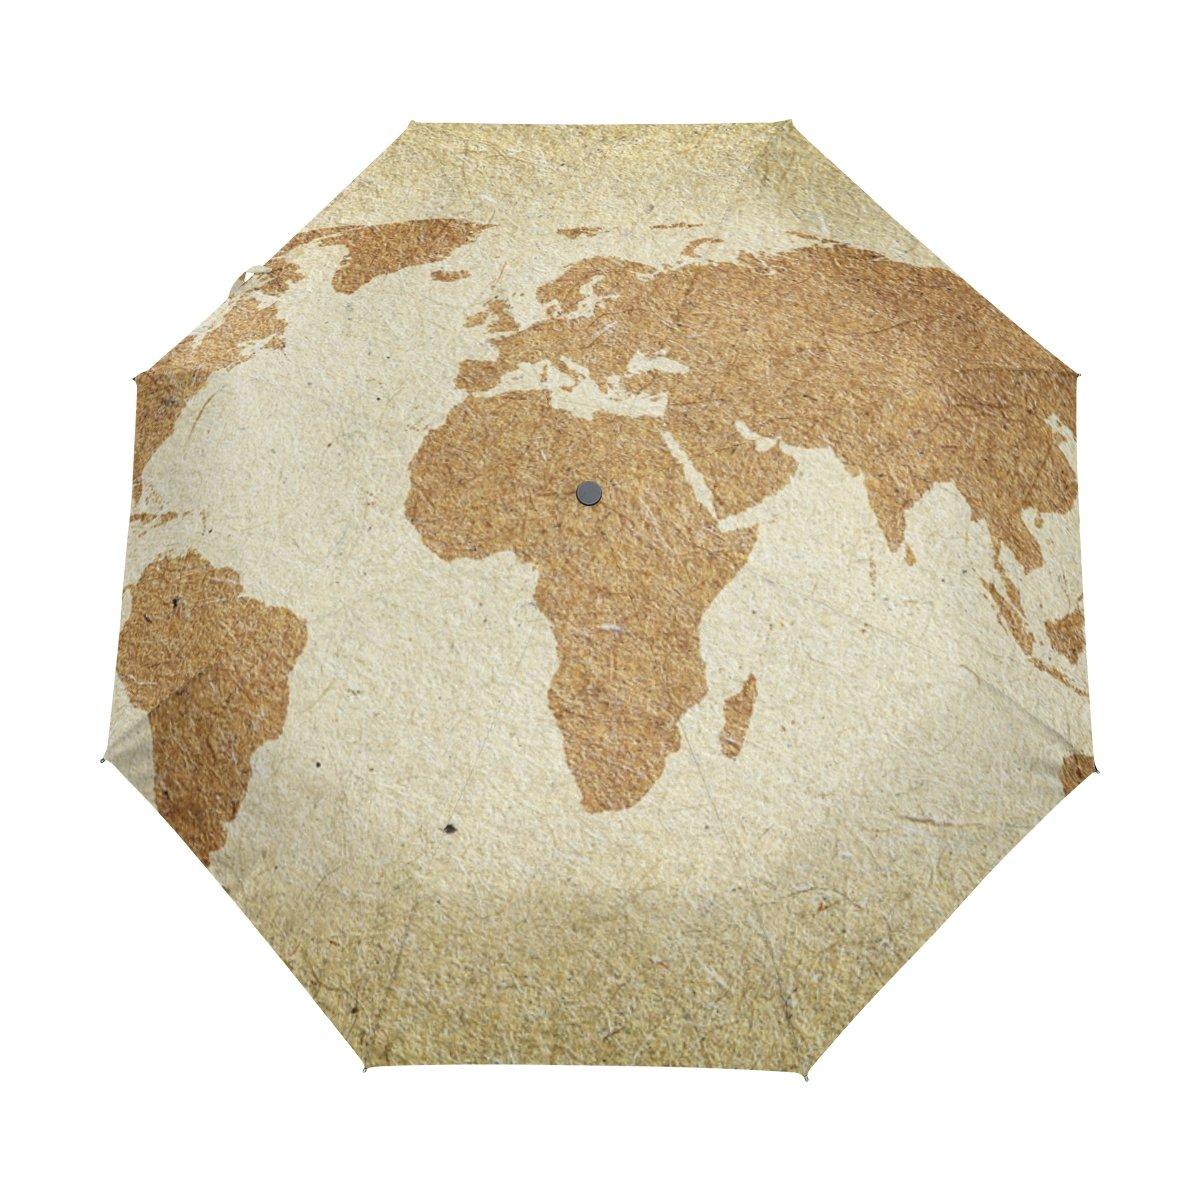 deyyaヴィンテージワールドマップカスタム折りたたみ式太陽雨傘Wind Resistant防風折りたたみトラベル傘 B0757NG2Y6